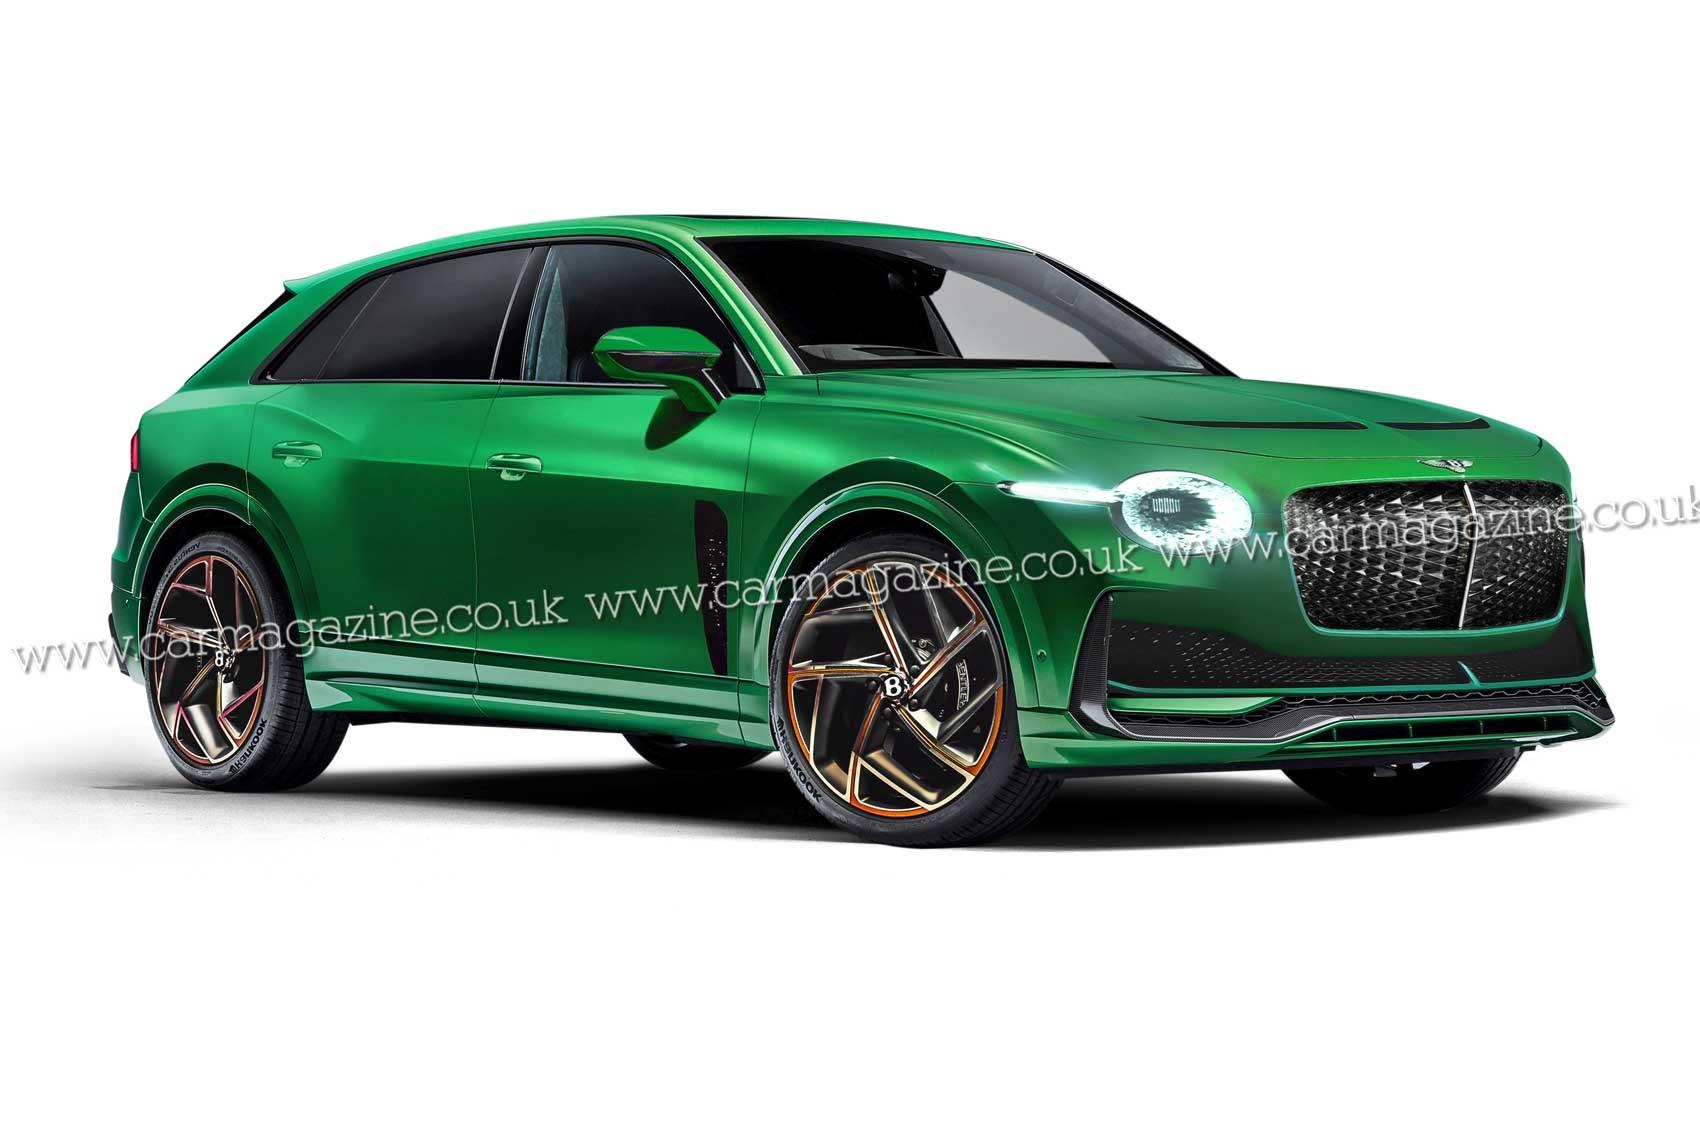 Electro-luxe: Bentley's 2025 EV scooped